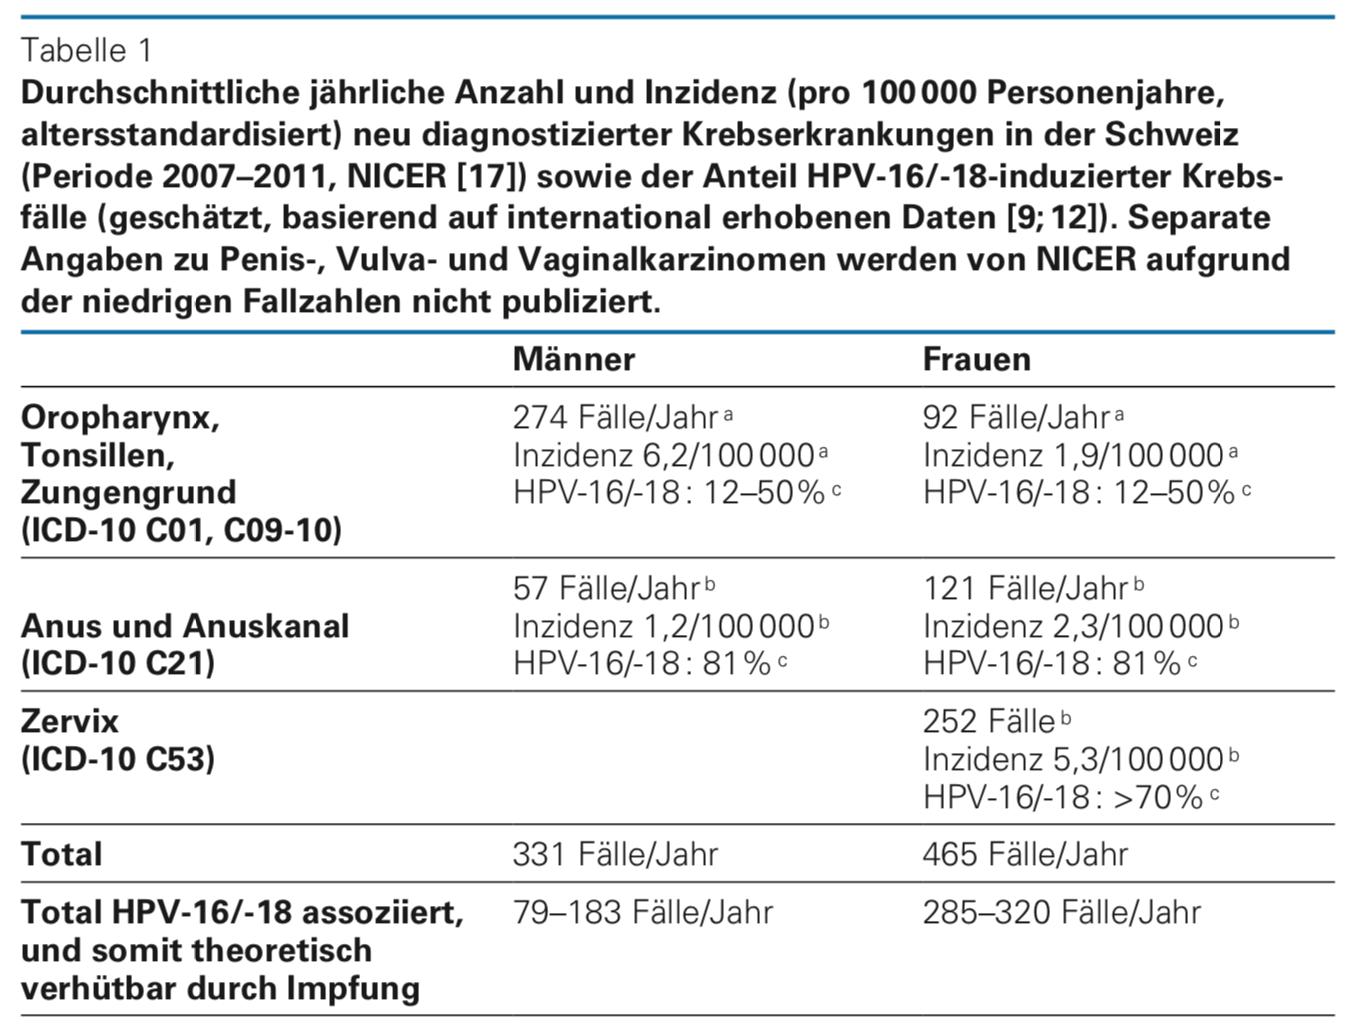 gardasil impfung ziffer ebm